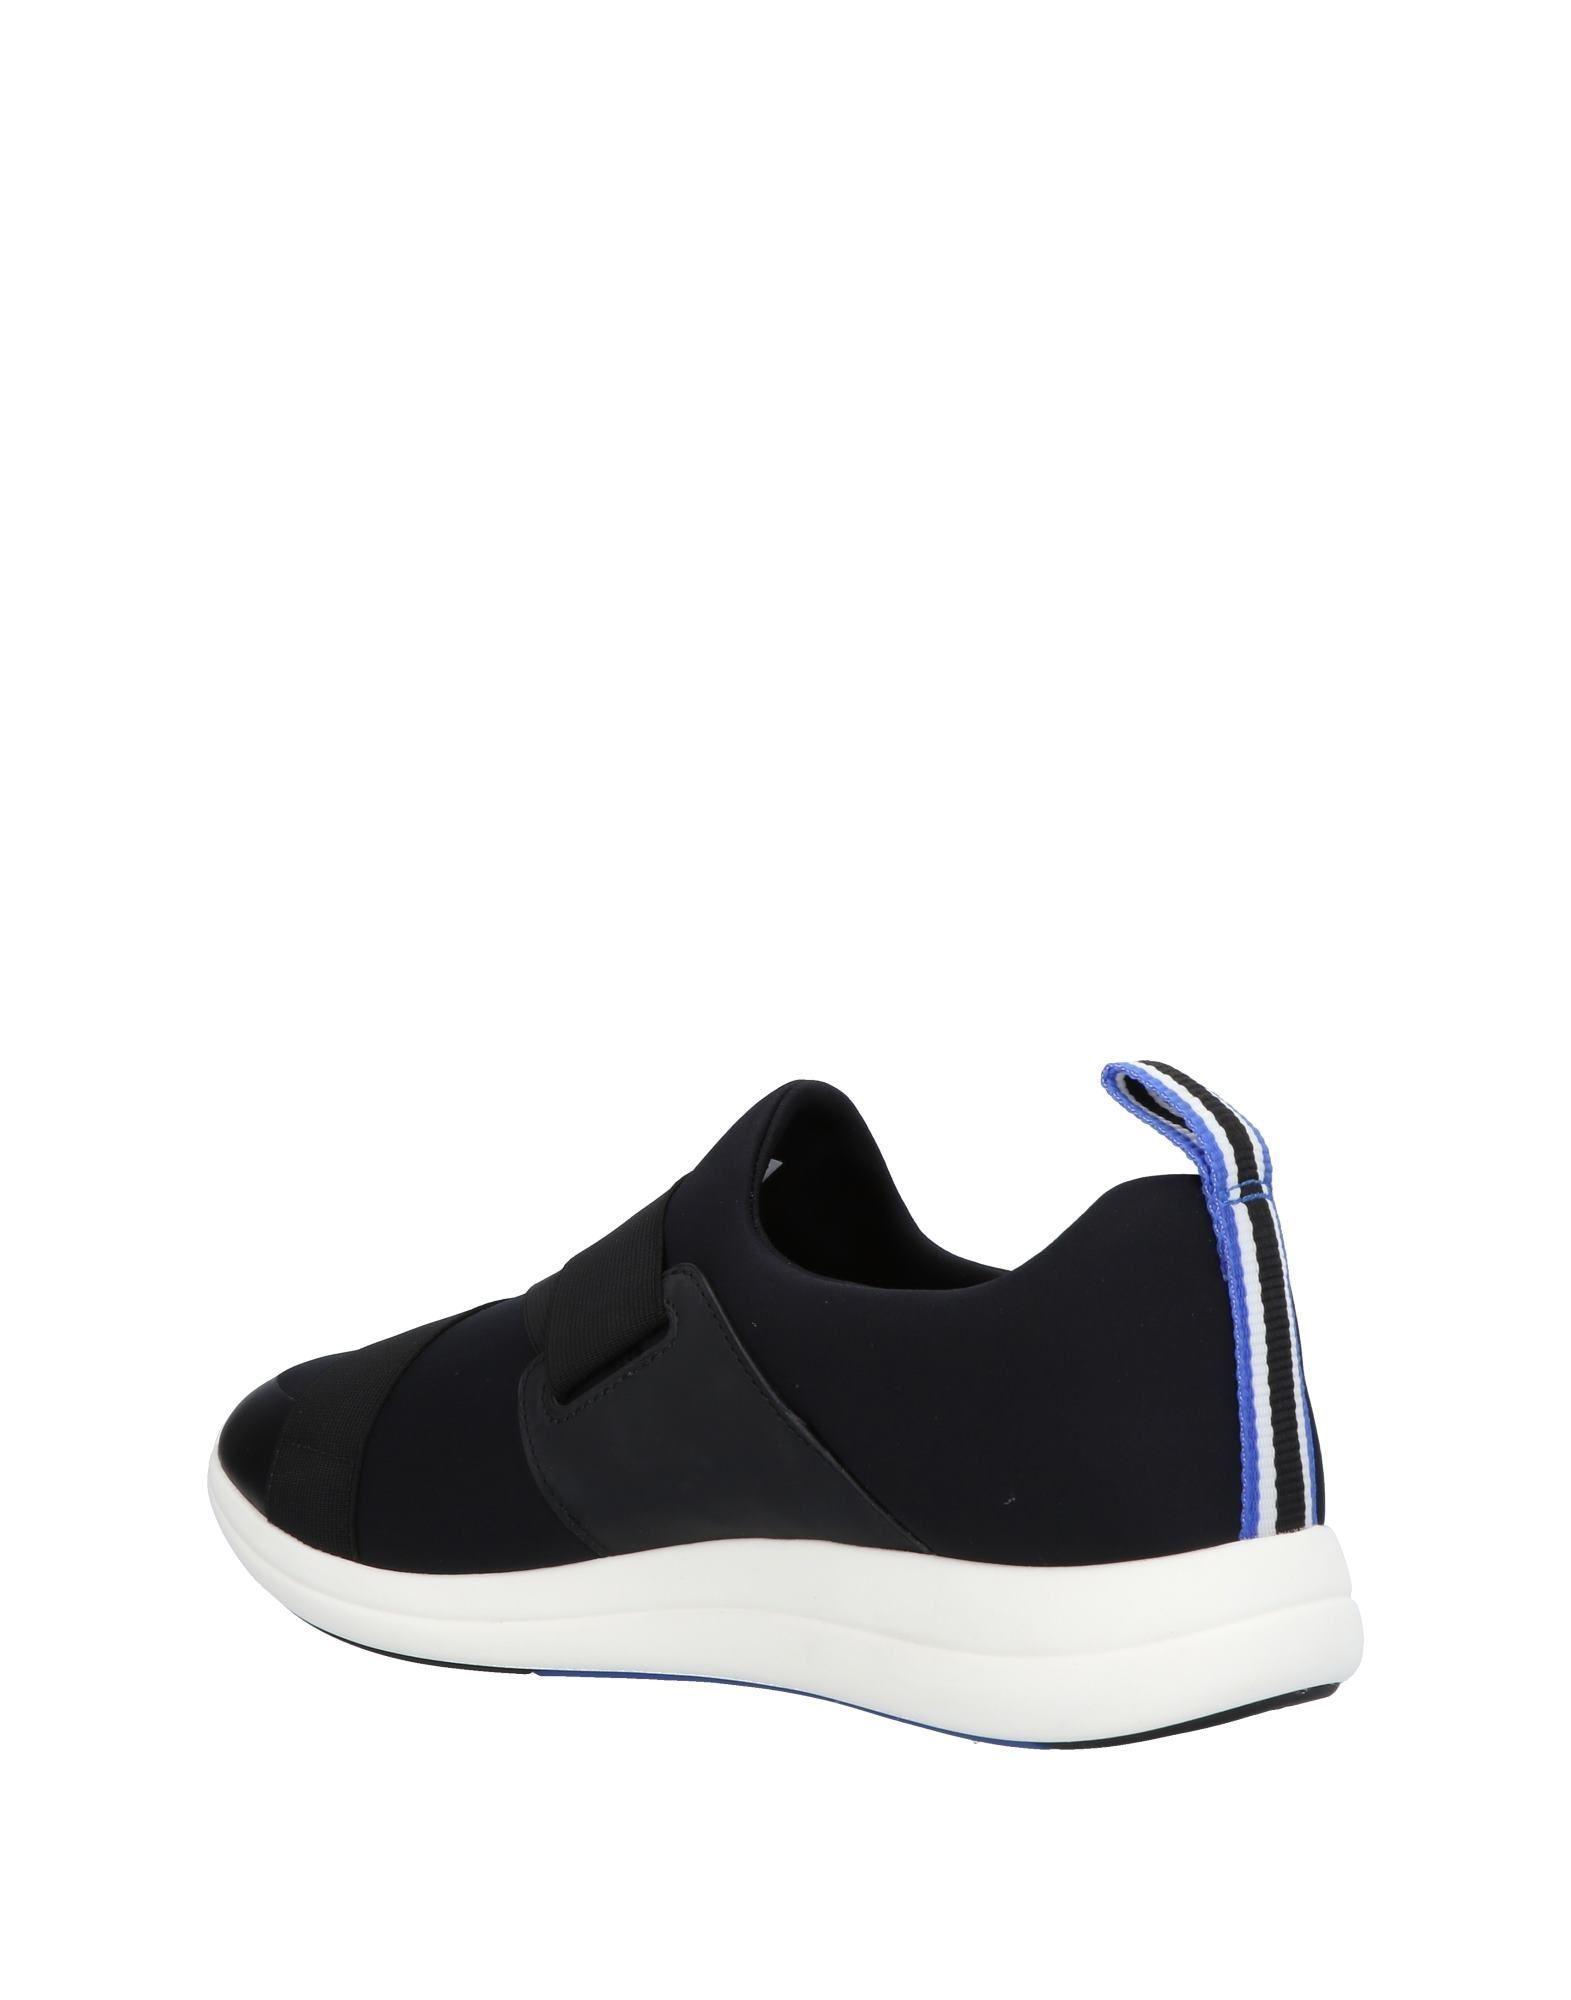 Sneakers & Deportivas Tory Sport de Neopreno de color Negro